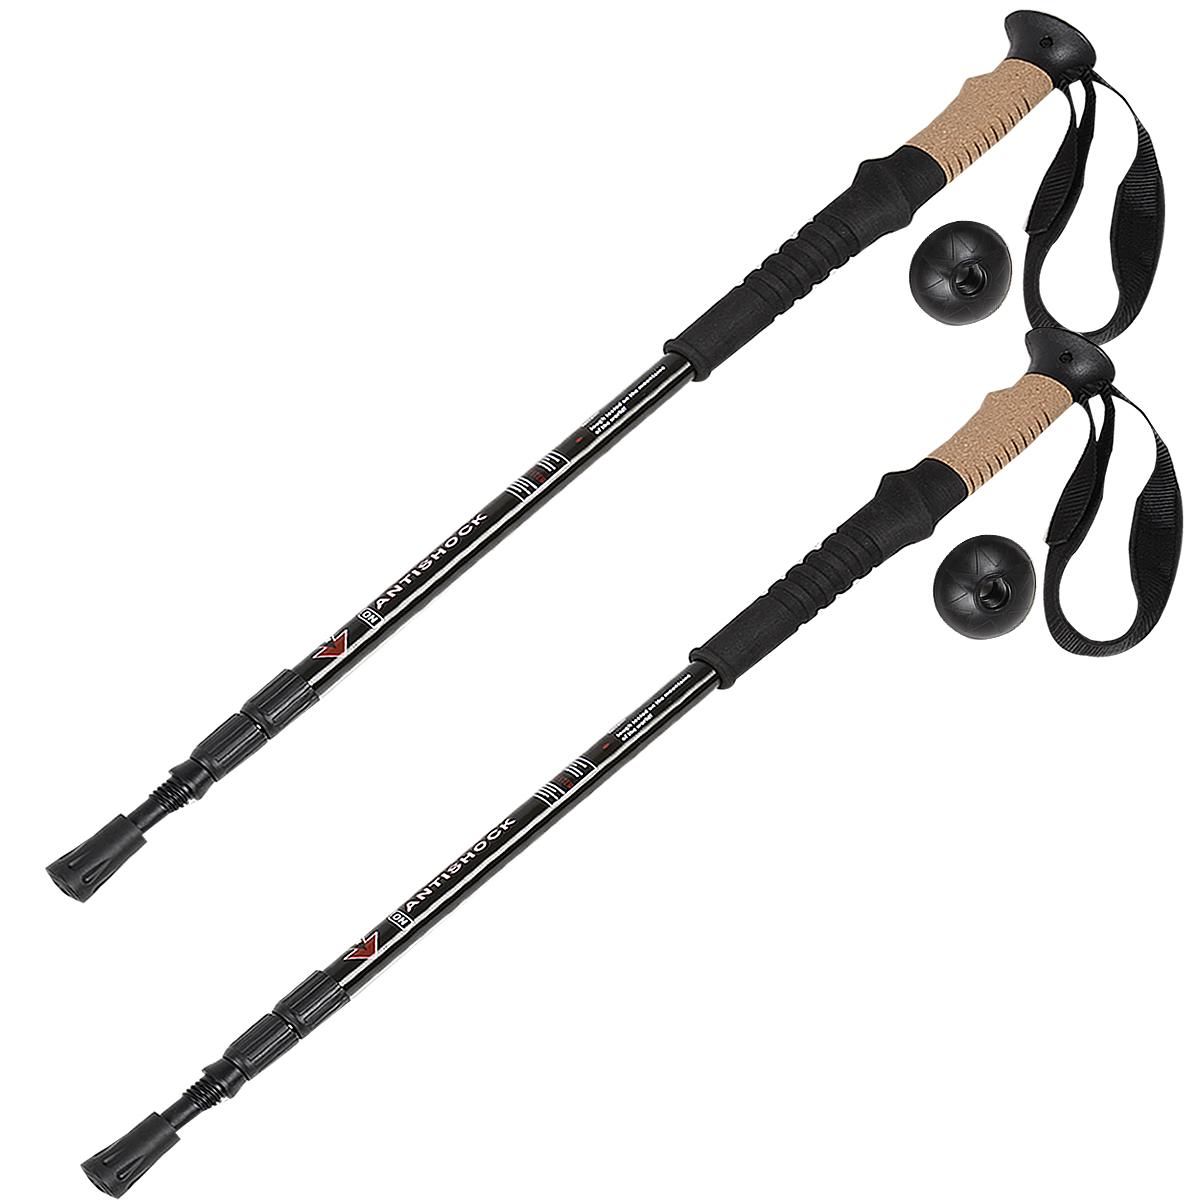 Pair 2 Alpenstock Adjustable Anti-Shock Hiking Sticks